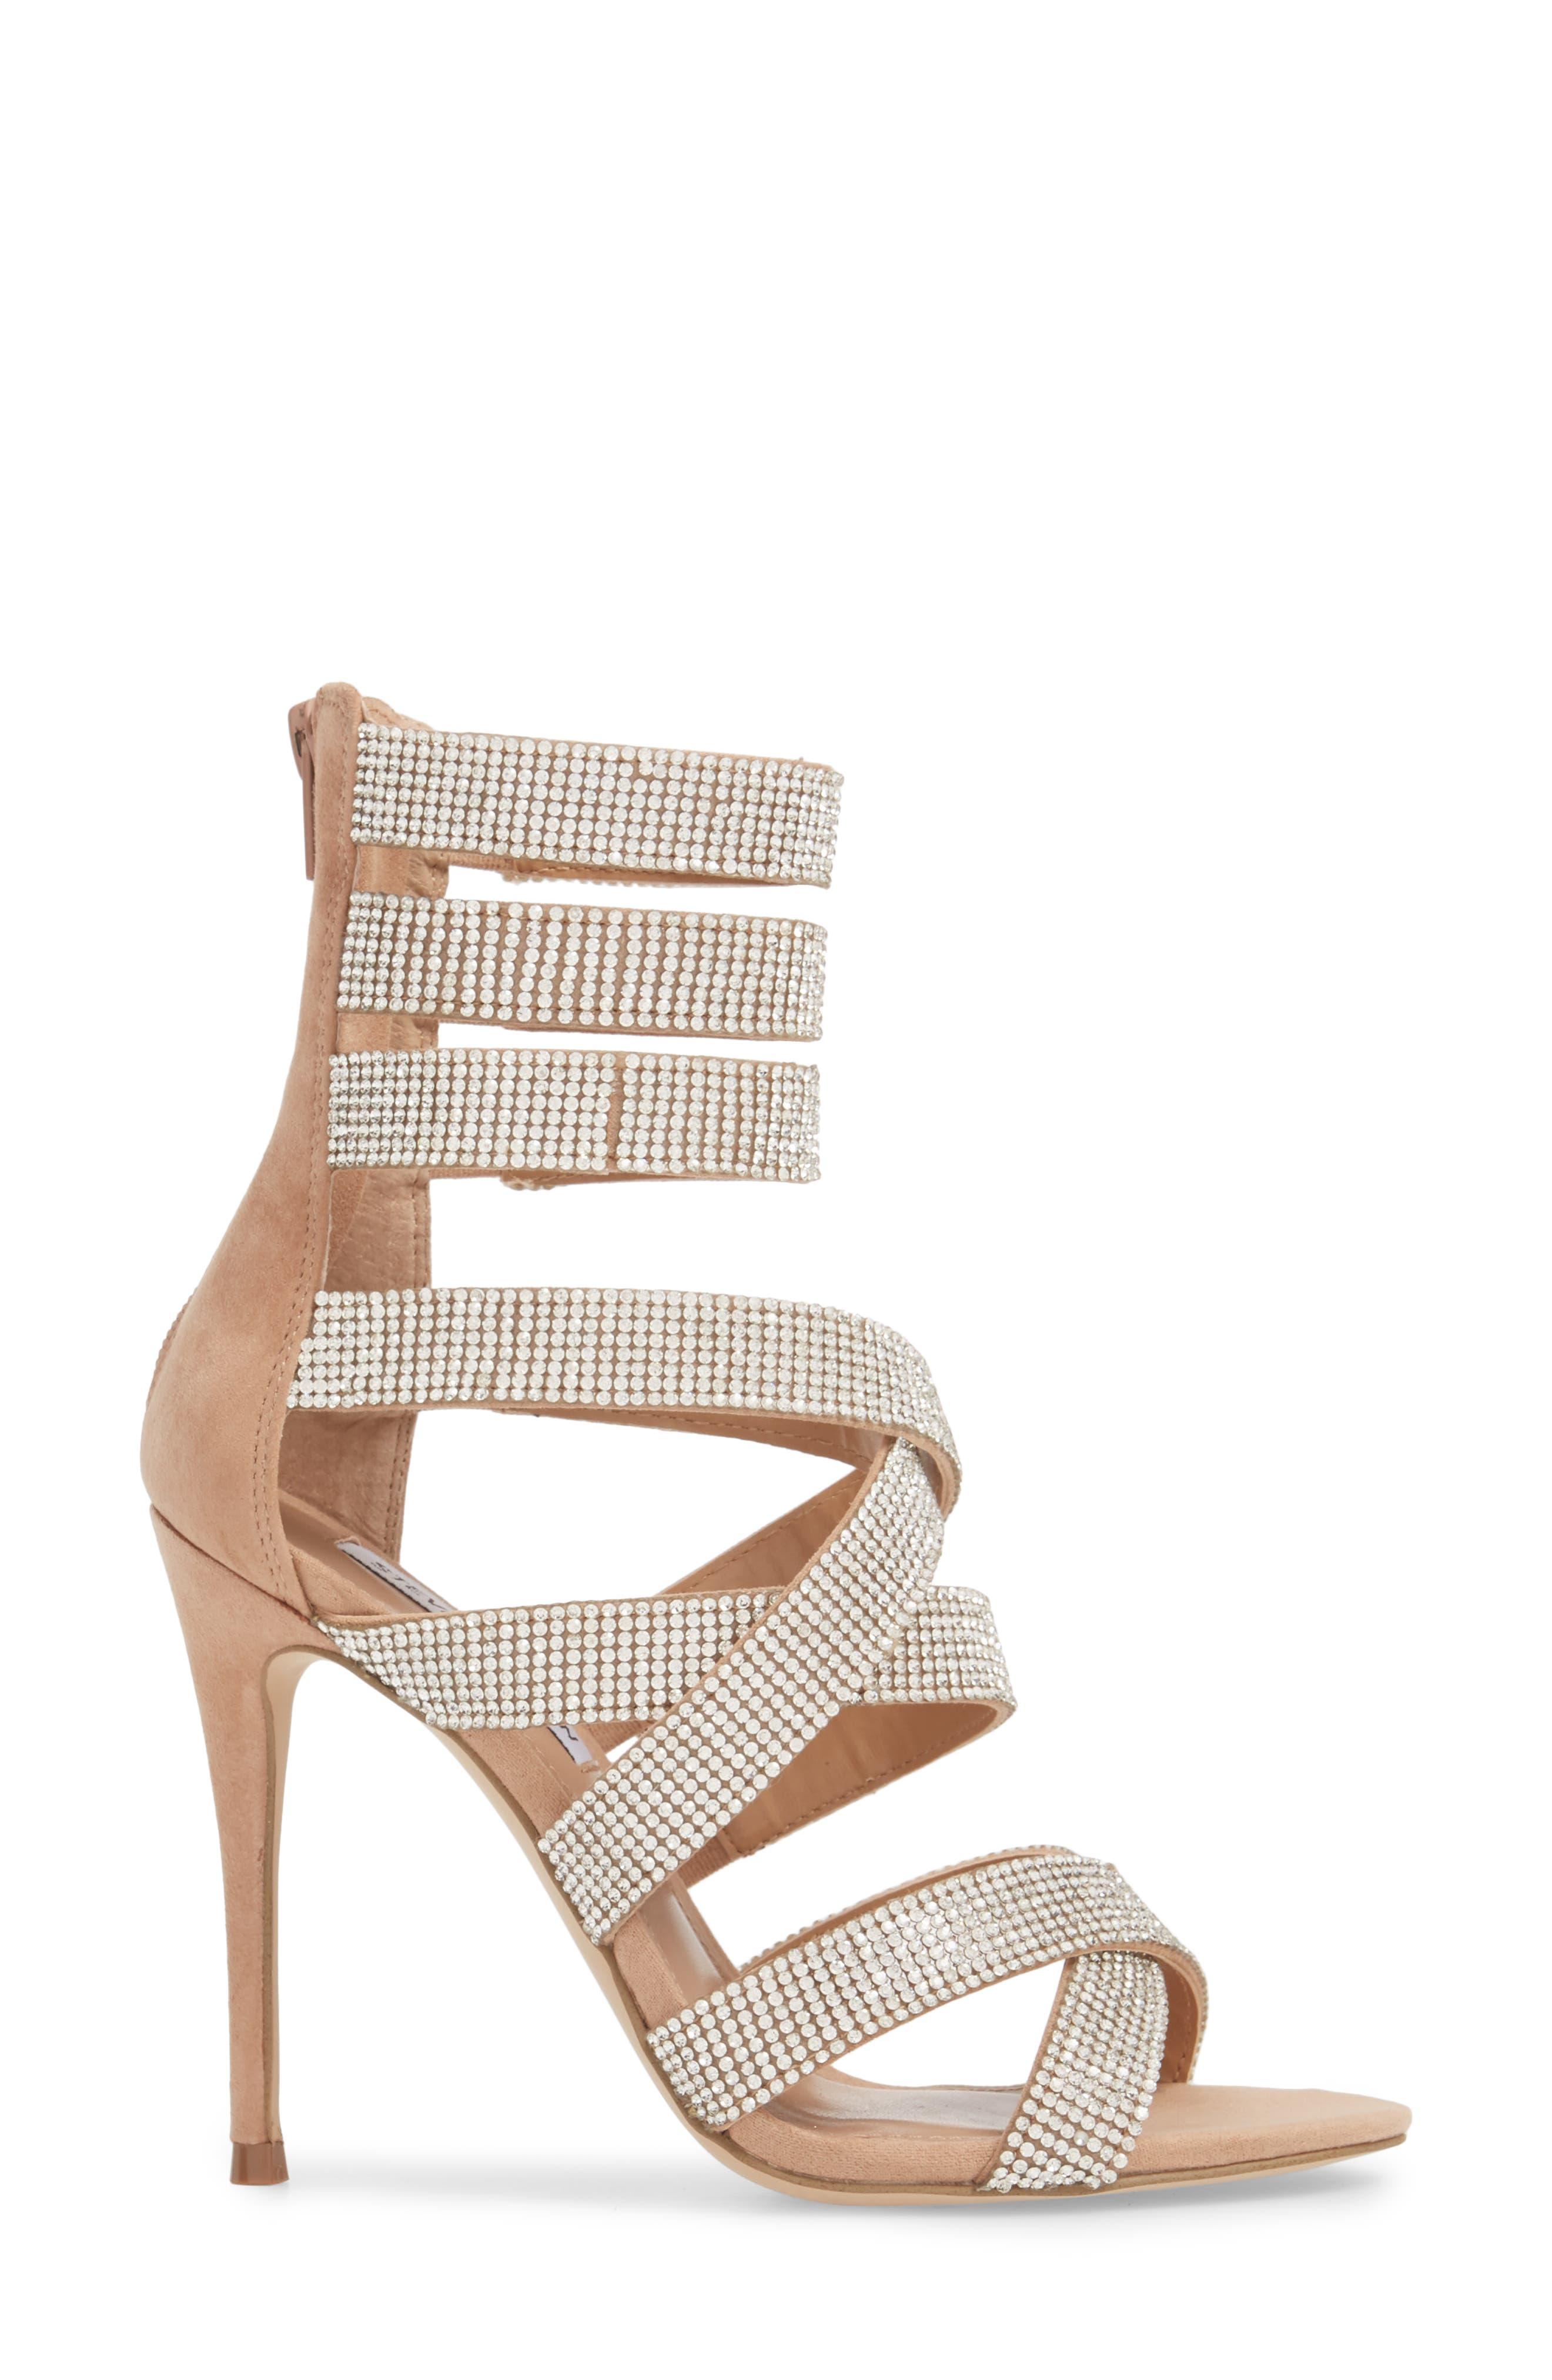 Malika Crystal Embellished Sandal,                             Alternate thumbnail 6, color,                             Rhinestone